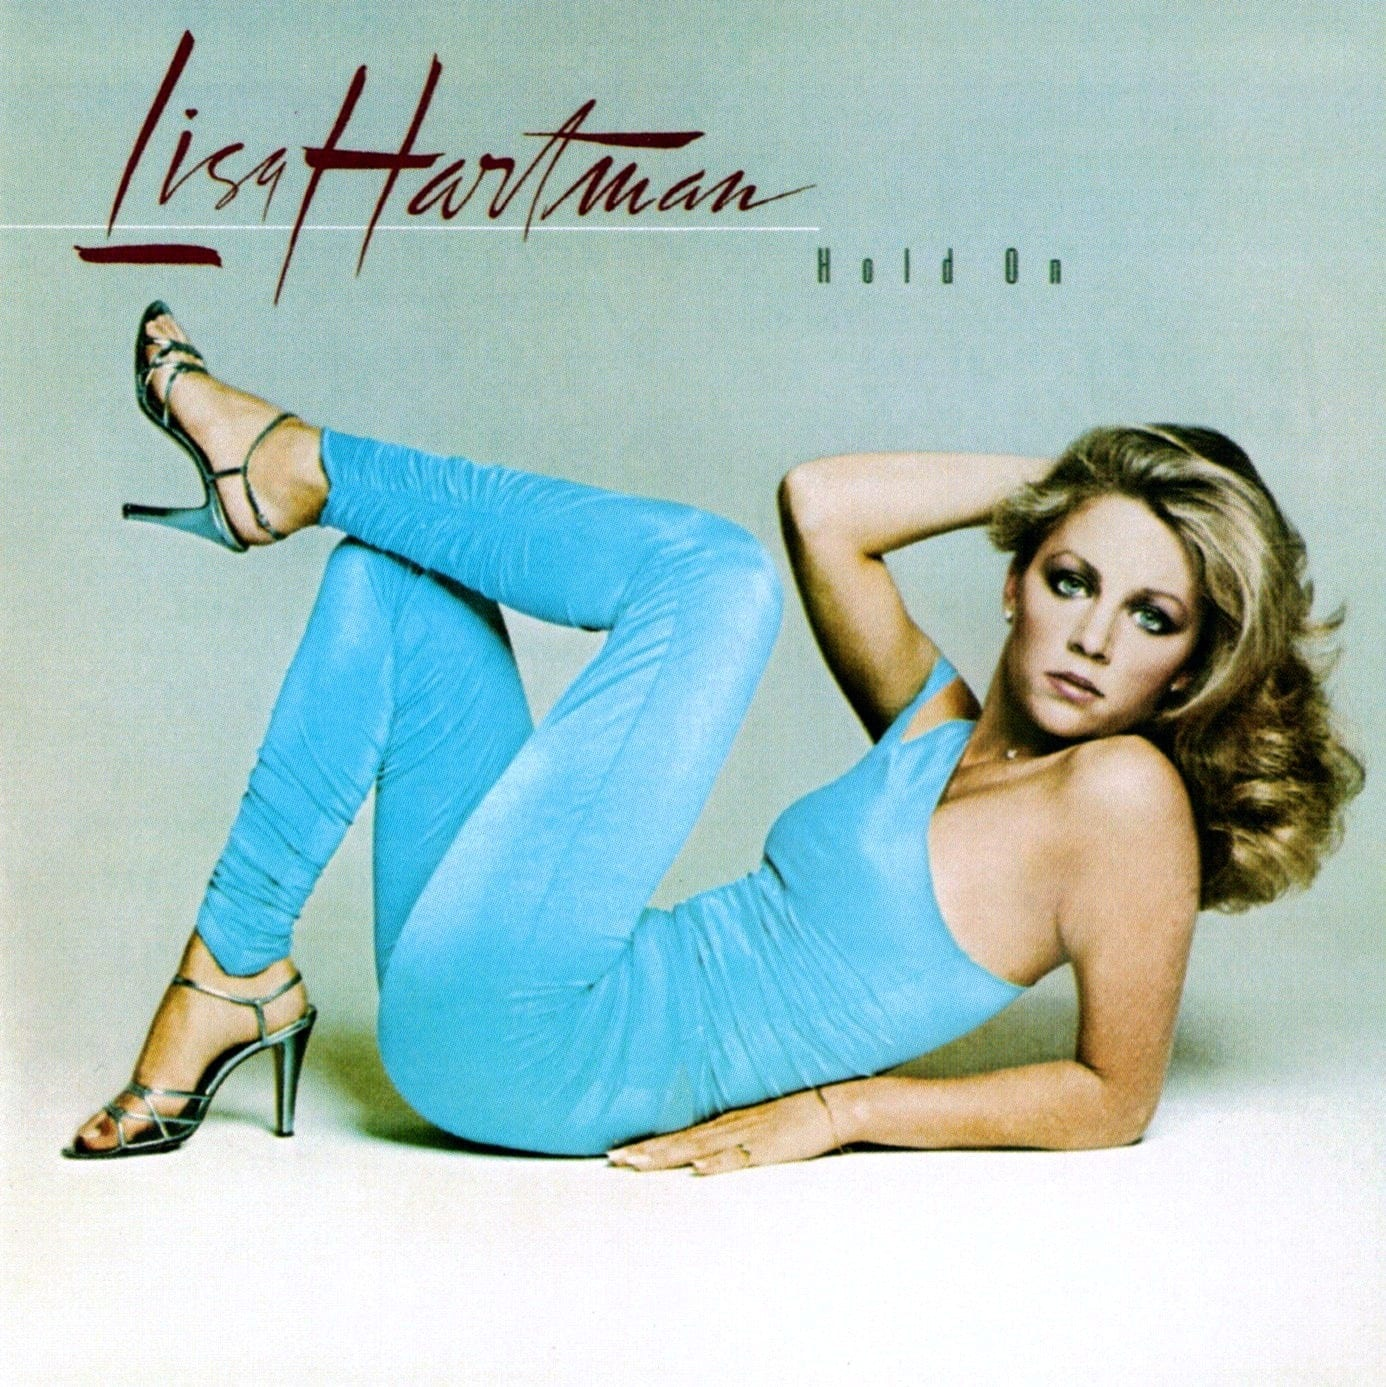 Lisa Hartman - Lisa Hartman / Letterock (2019 EXPANDED EDITION) (Knots Landing) (1983) CD 10